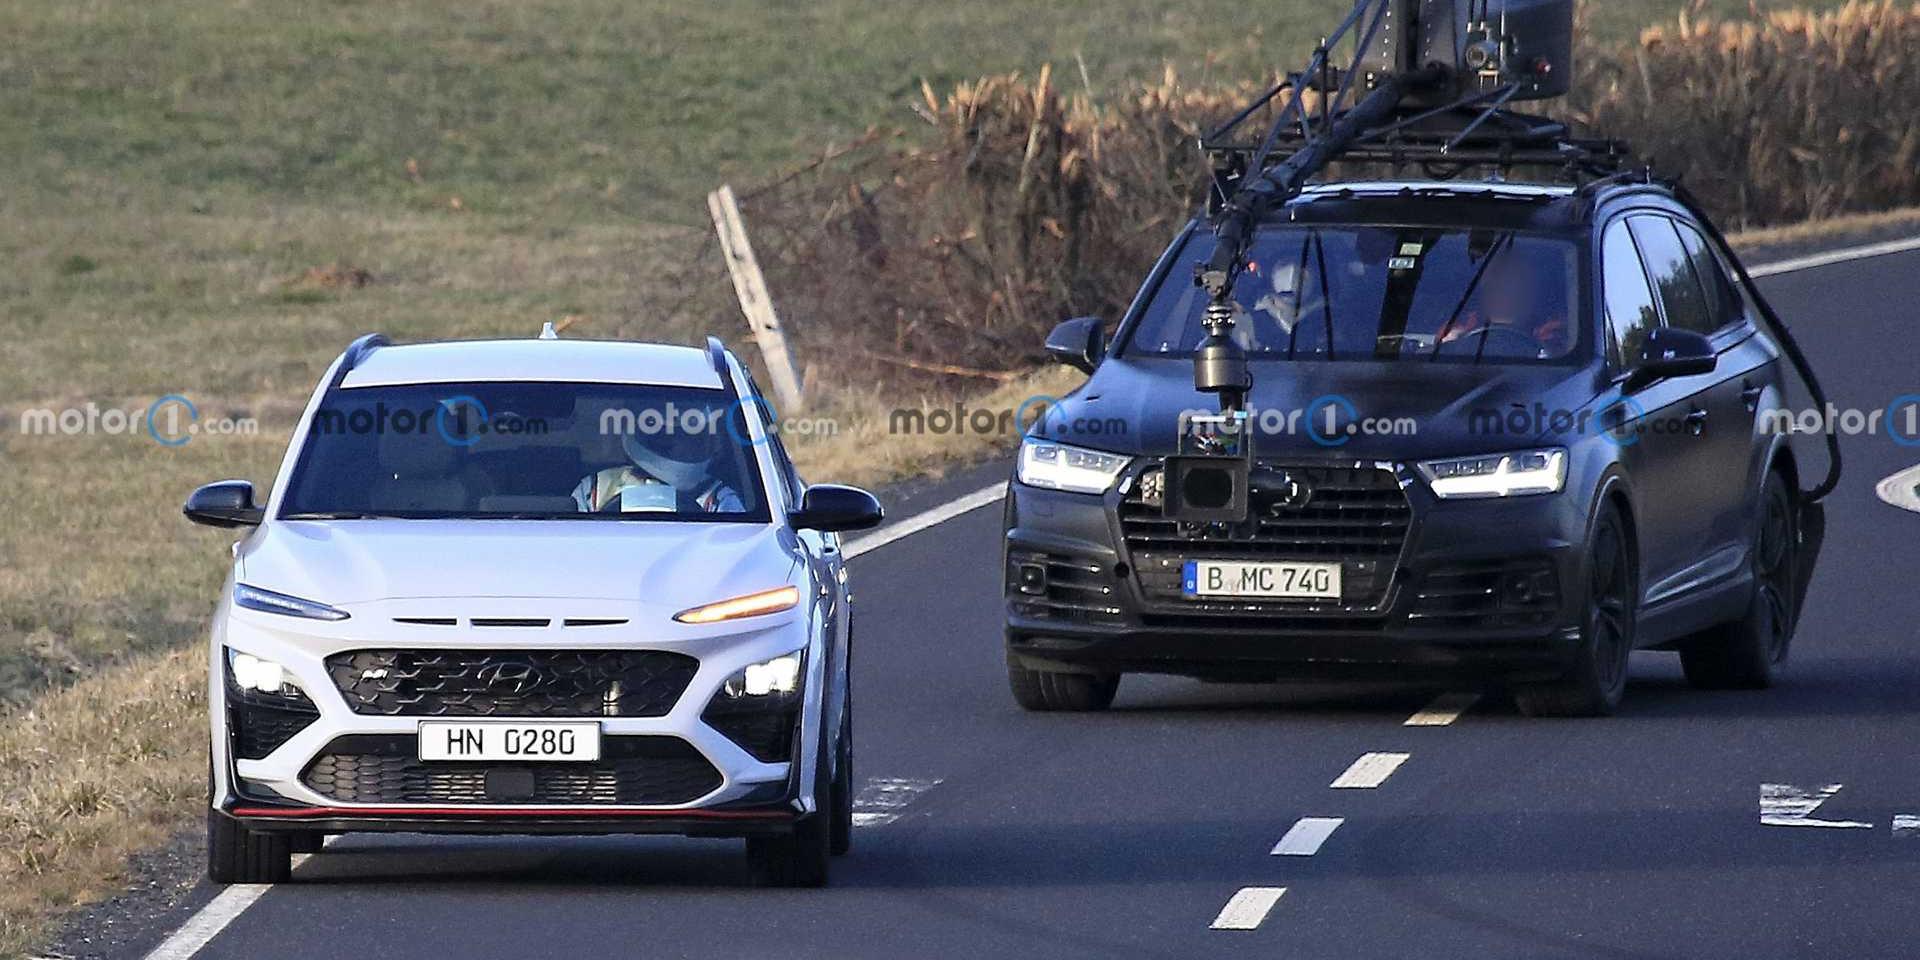 Hyundai Kona N實車全都露!拍攝廠照無偽裝入鏡!